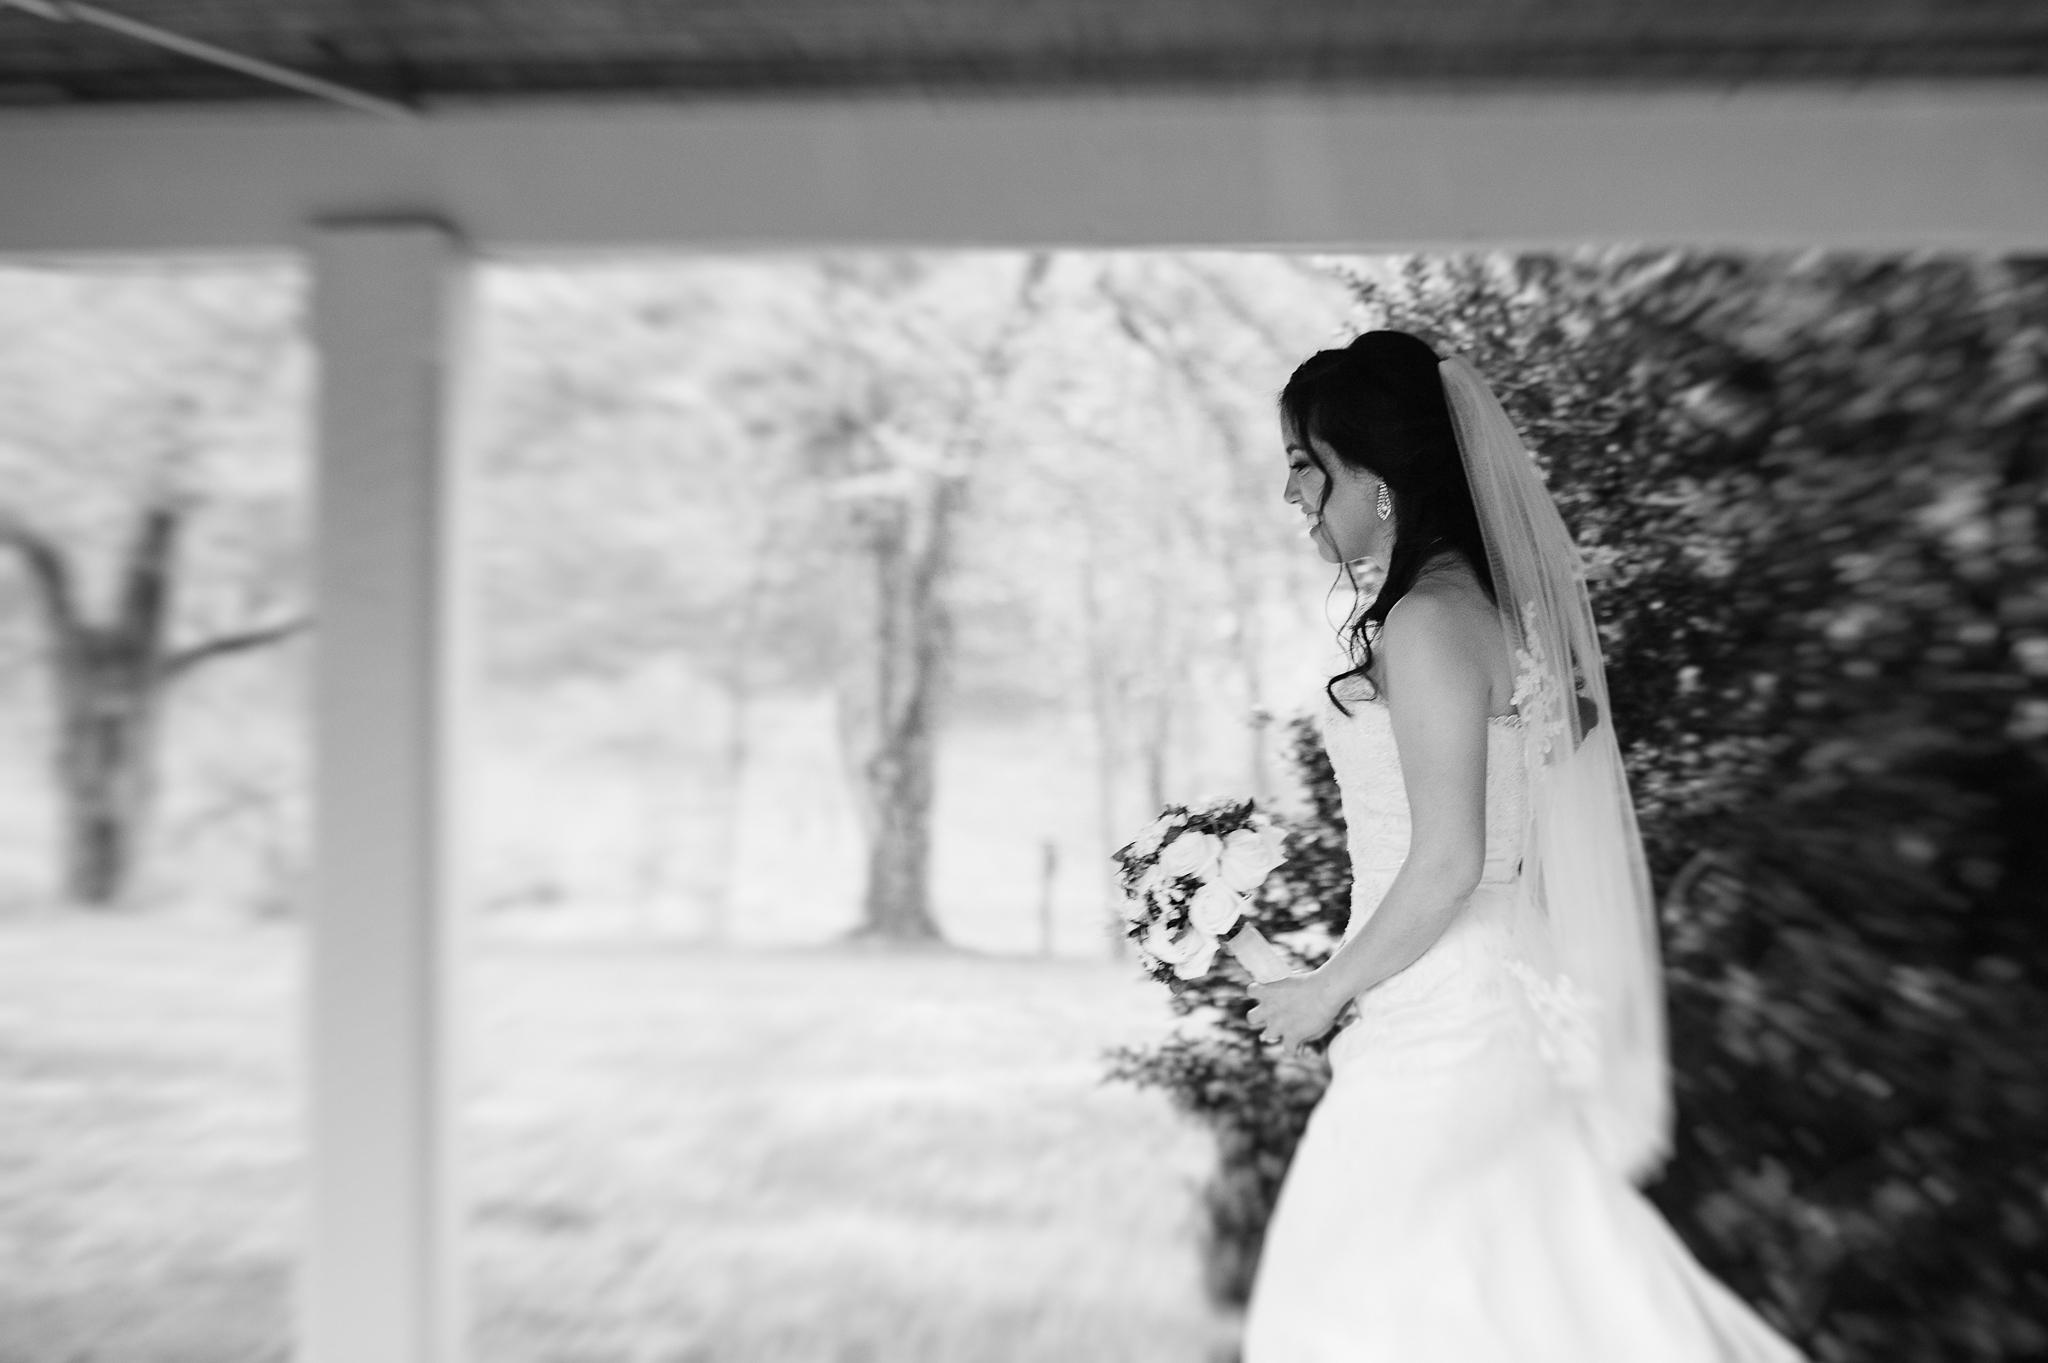 virginiawedding_rainwedding_CabellsMill_youseephotography_LizBen(8).jpg